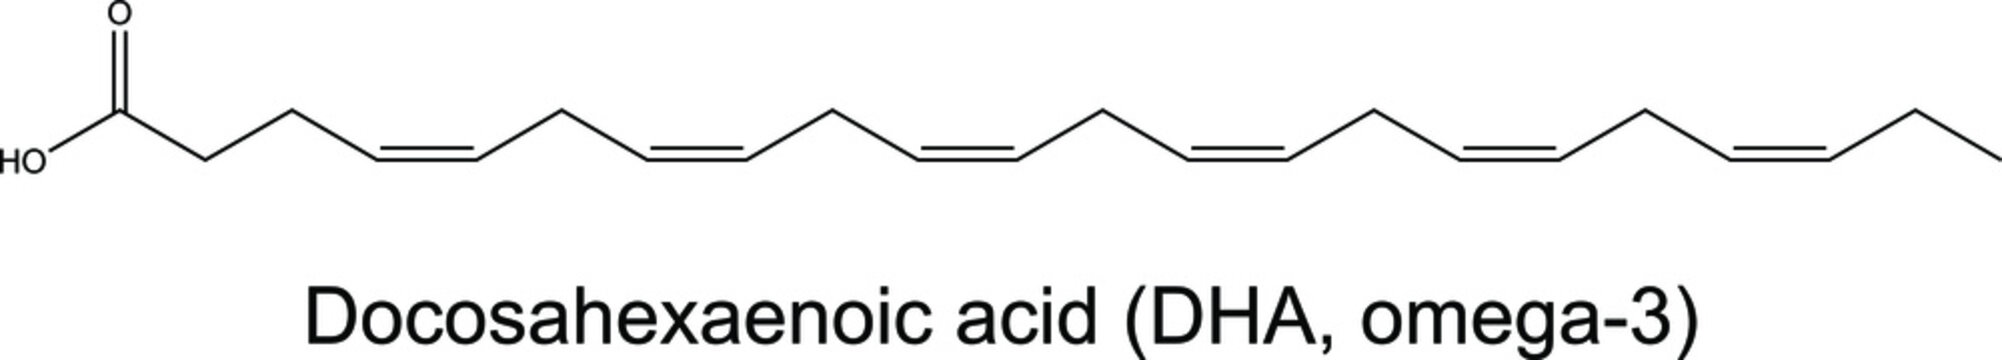 Docosahexaenoic acid DHA omega-3 molecule chemical formula